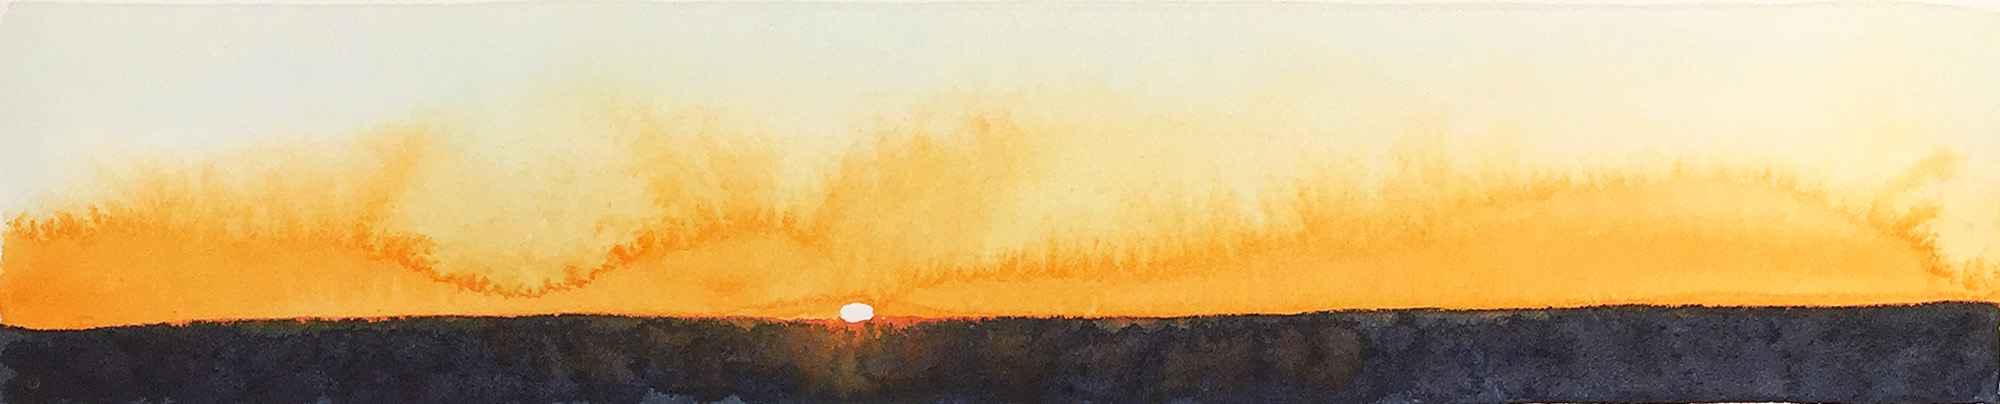 Morning Turn I by  Lisa Grossman - Masterpiece Online